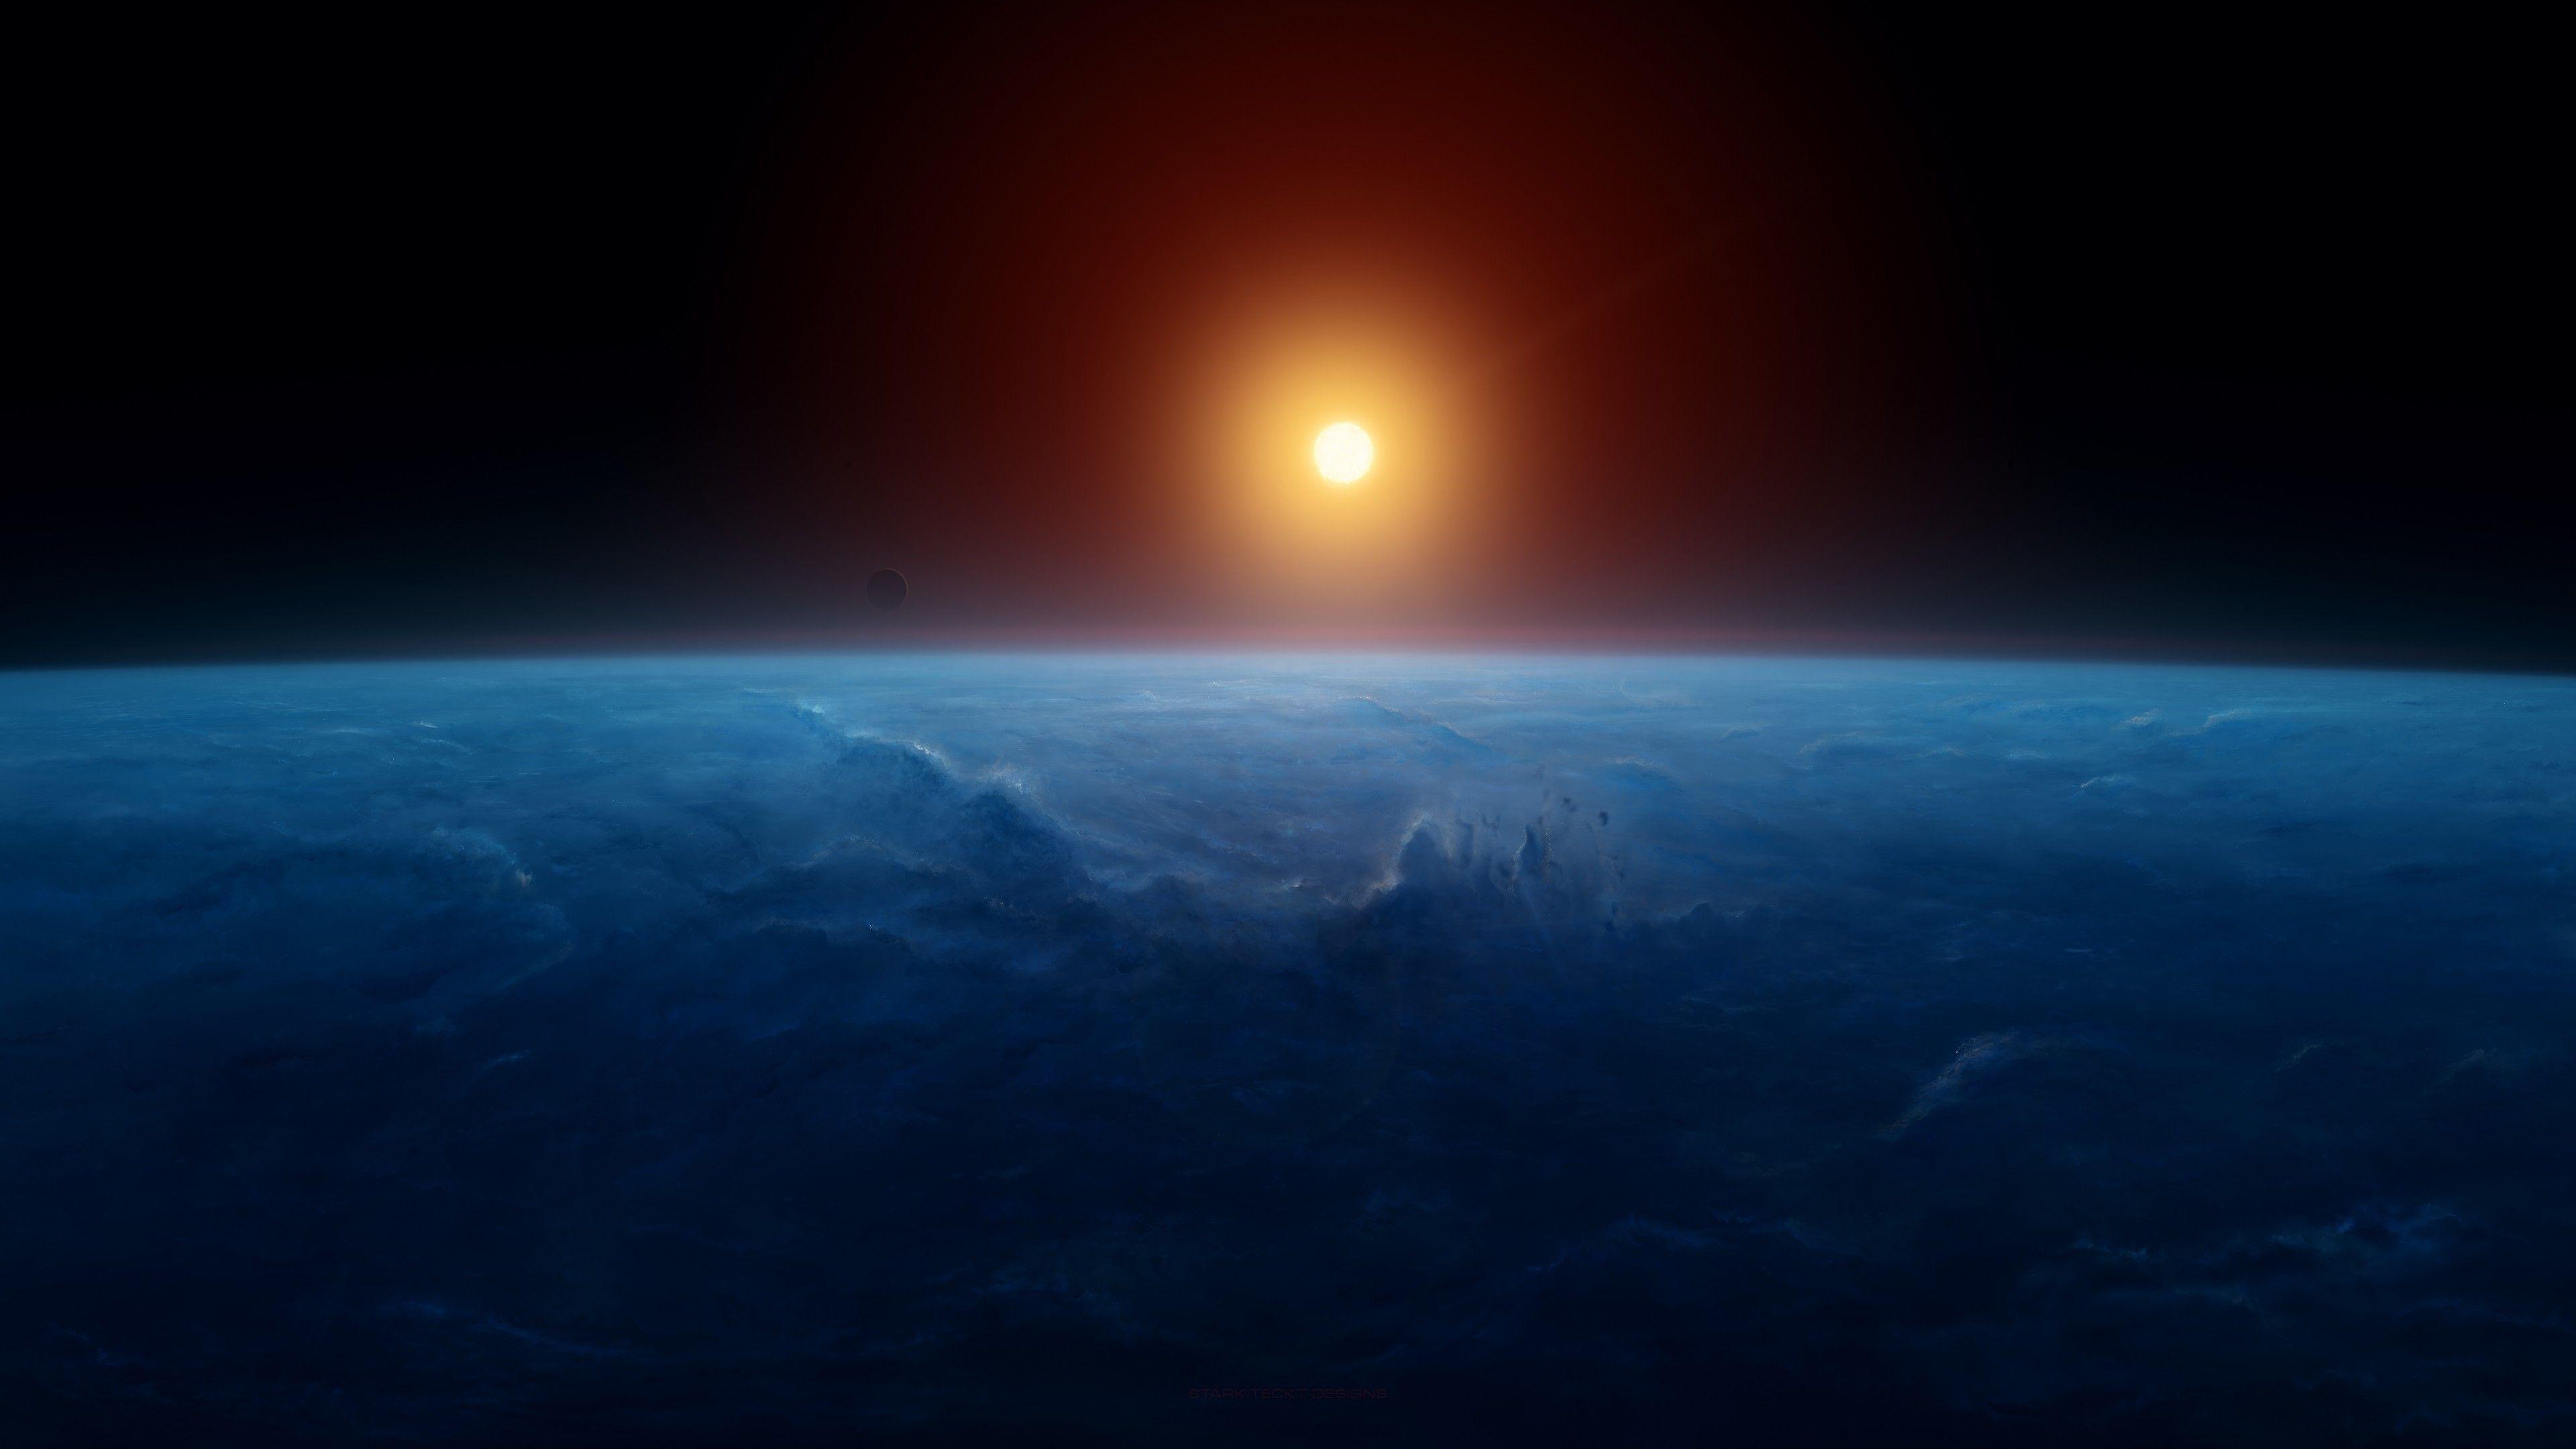 Galaxy sun earth horizon black and white wallpapers pinterest galaxy sun earth horizon amazingspace constellations earth fascinatinguniverse galaxy horizon infiniteuniverse outerplanets space stars sun altavistaventures Gallery